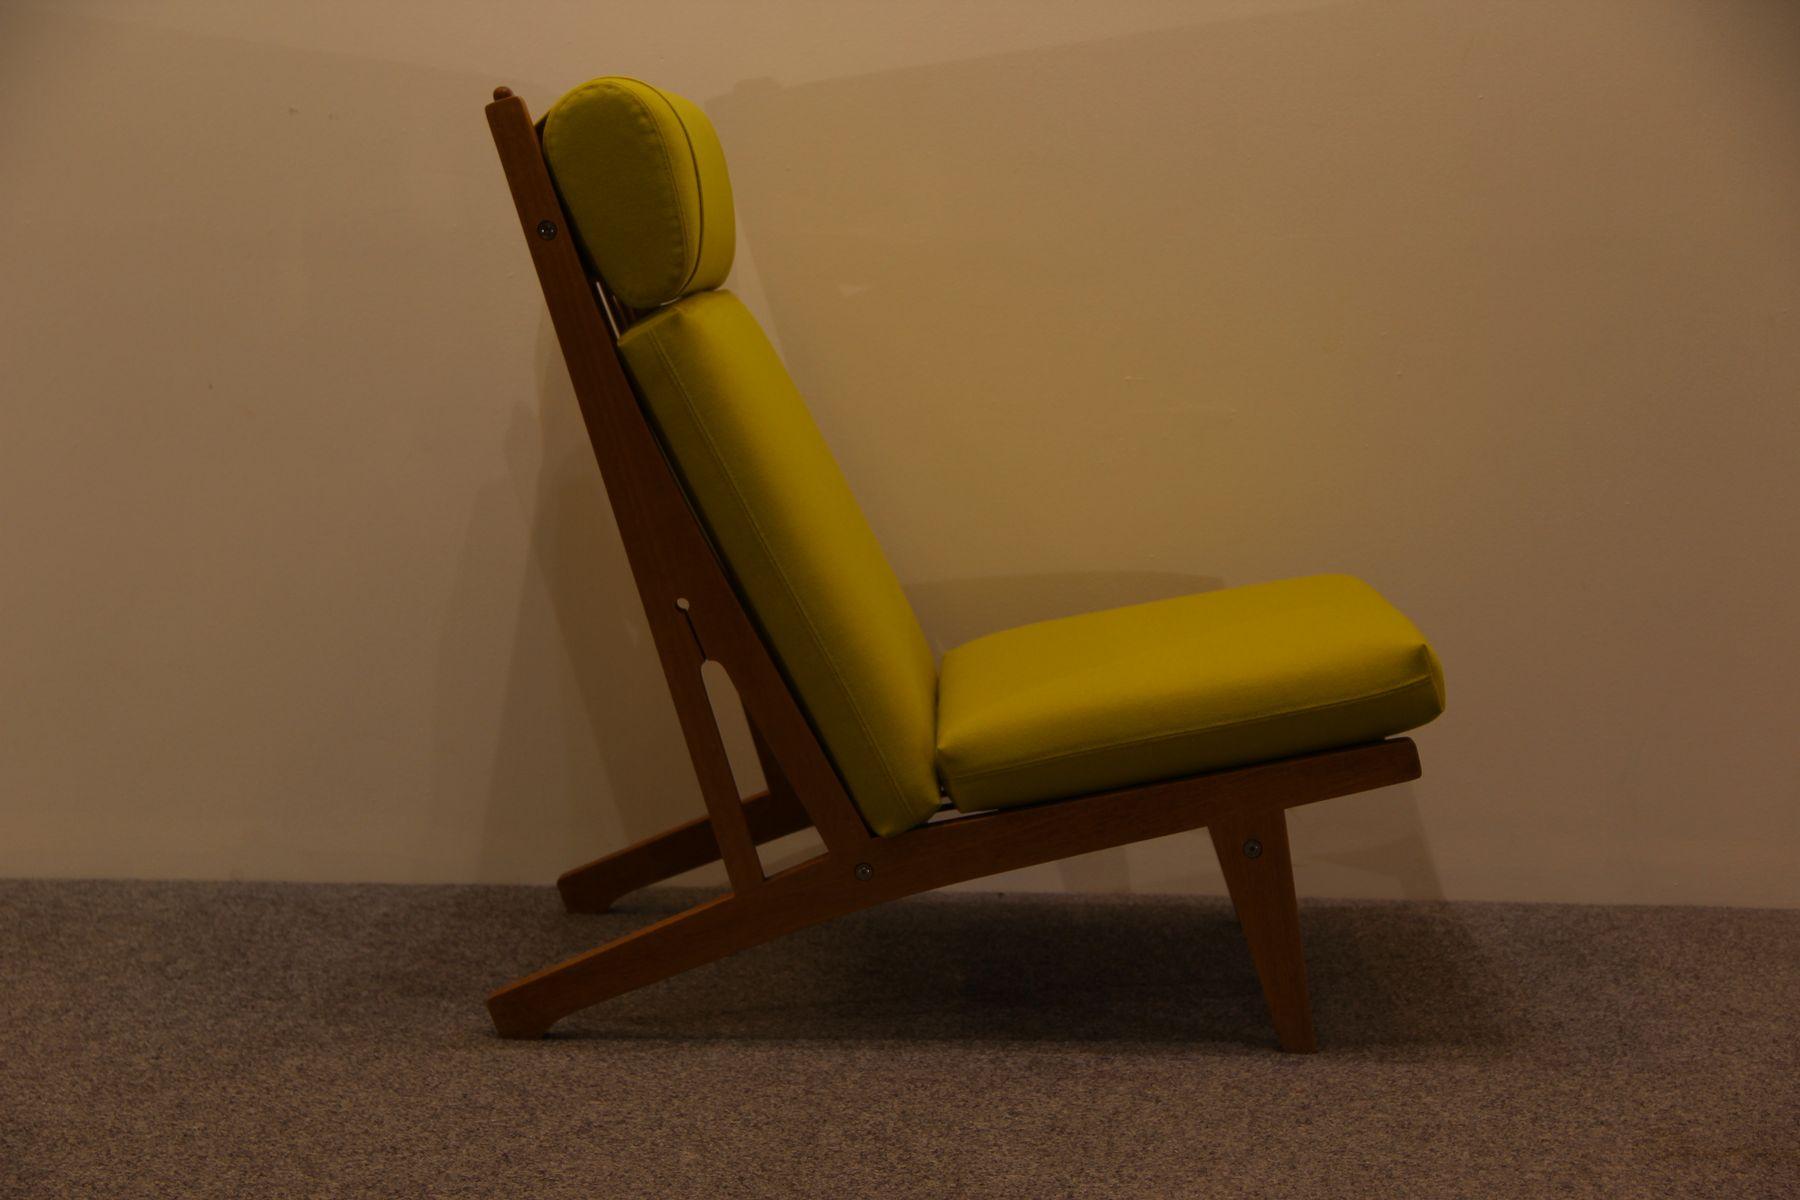 Danish Oak Lounge Chair with Yellow Cushions by Hans J Wegner for Getama 19